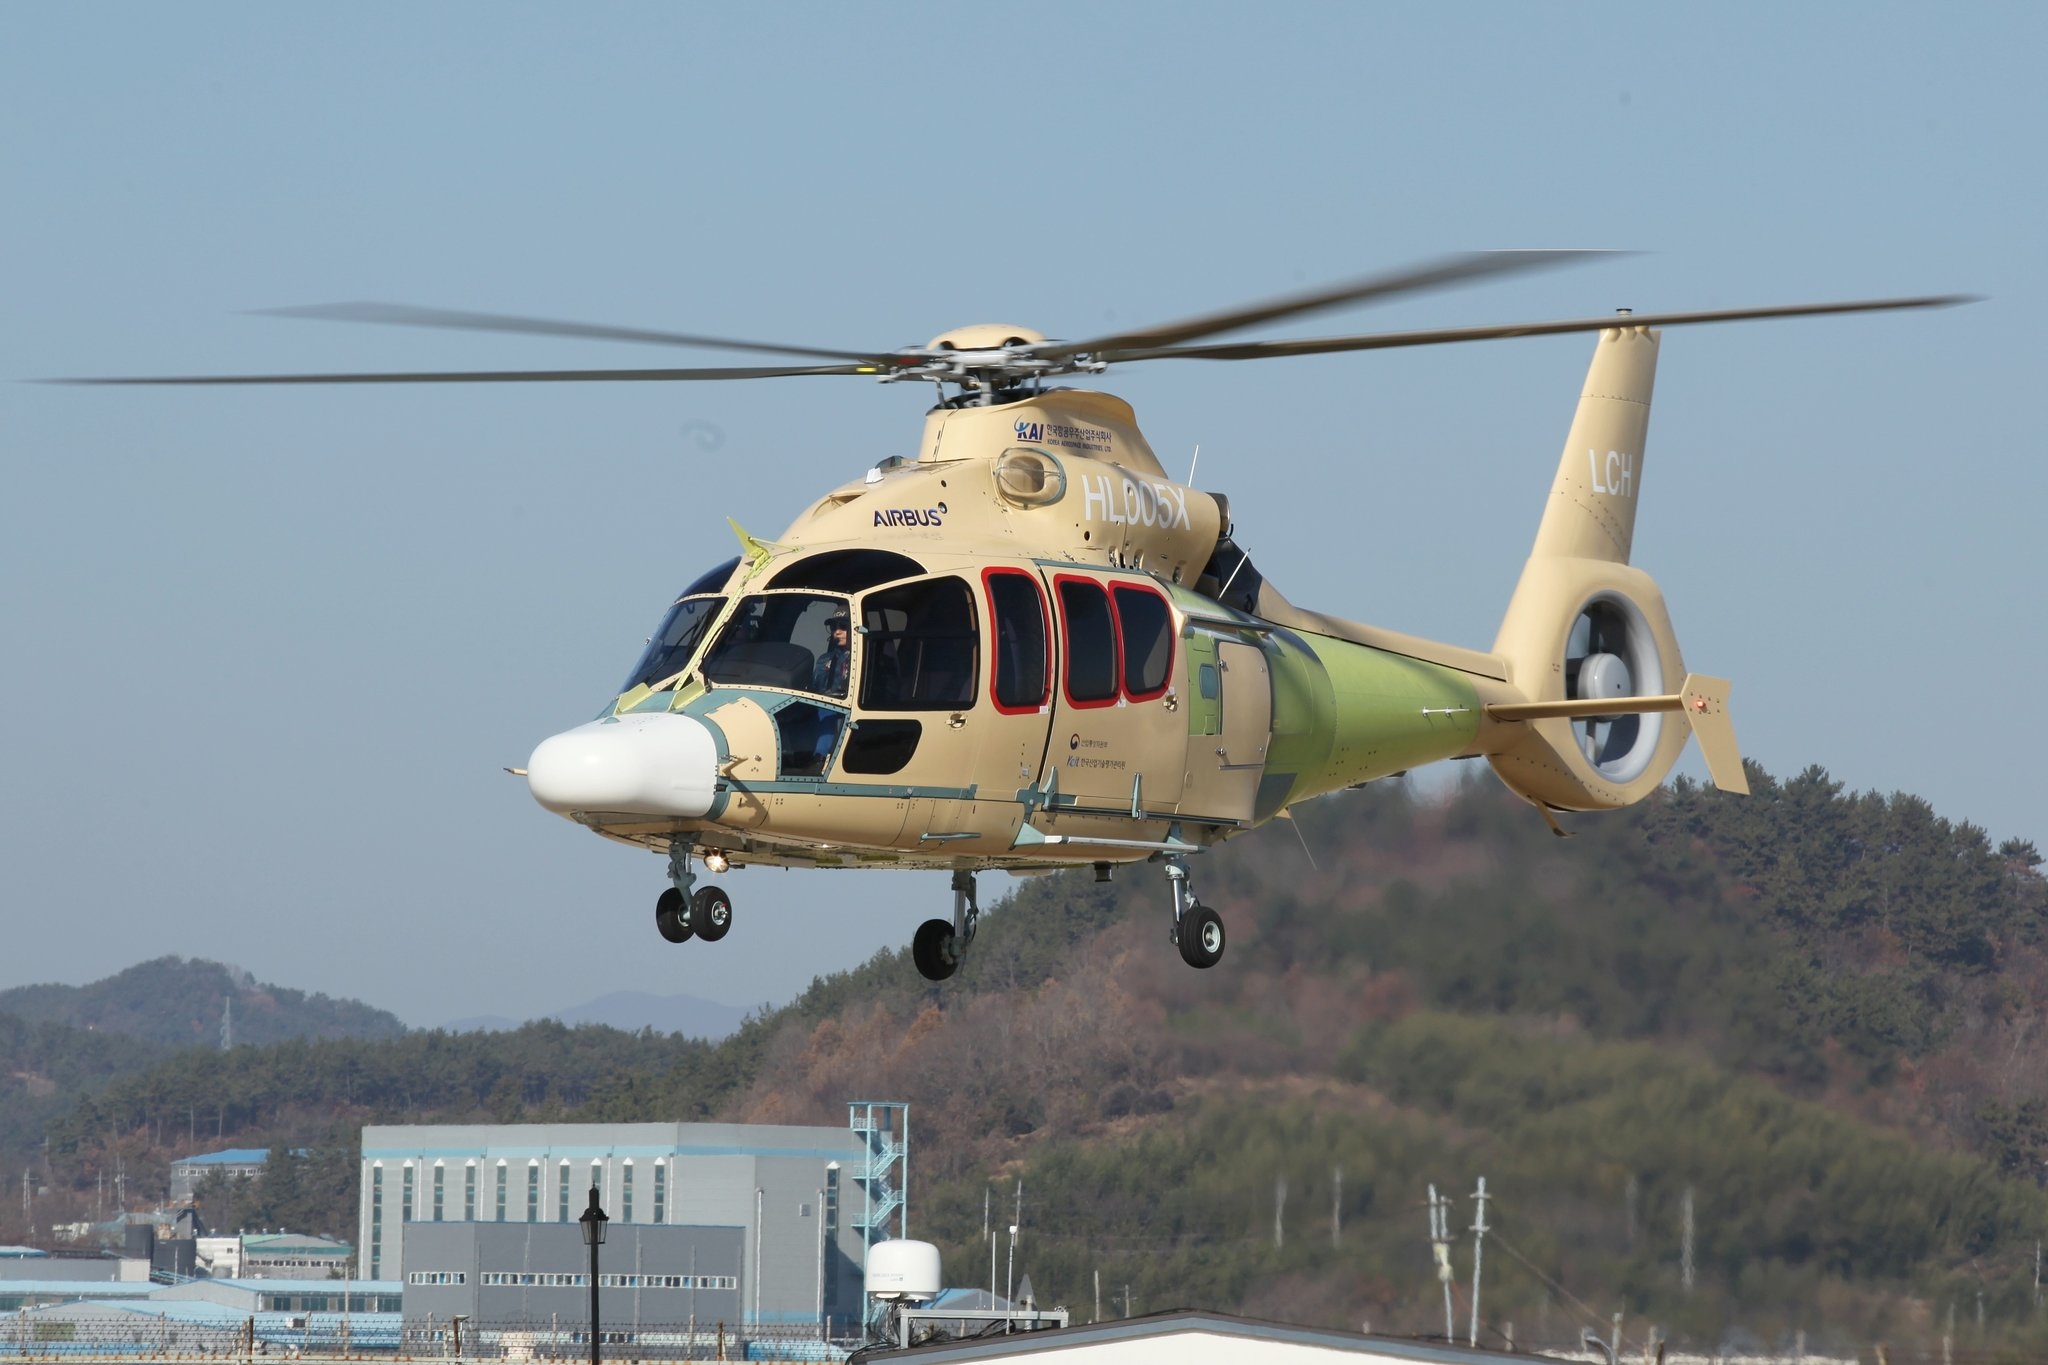 KAI, 국내 제작 소형 민수헬기 첫 비행 성공